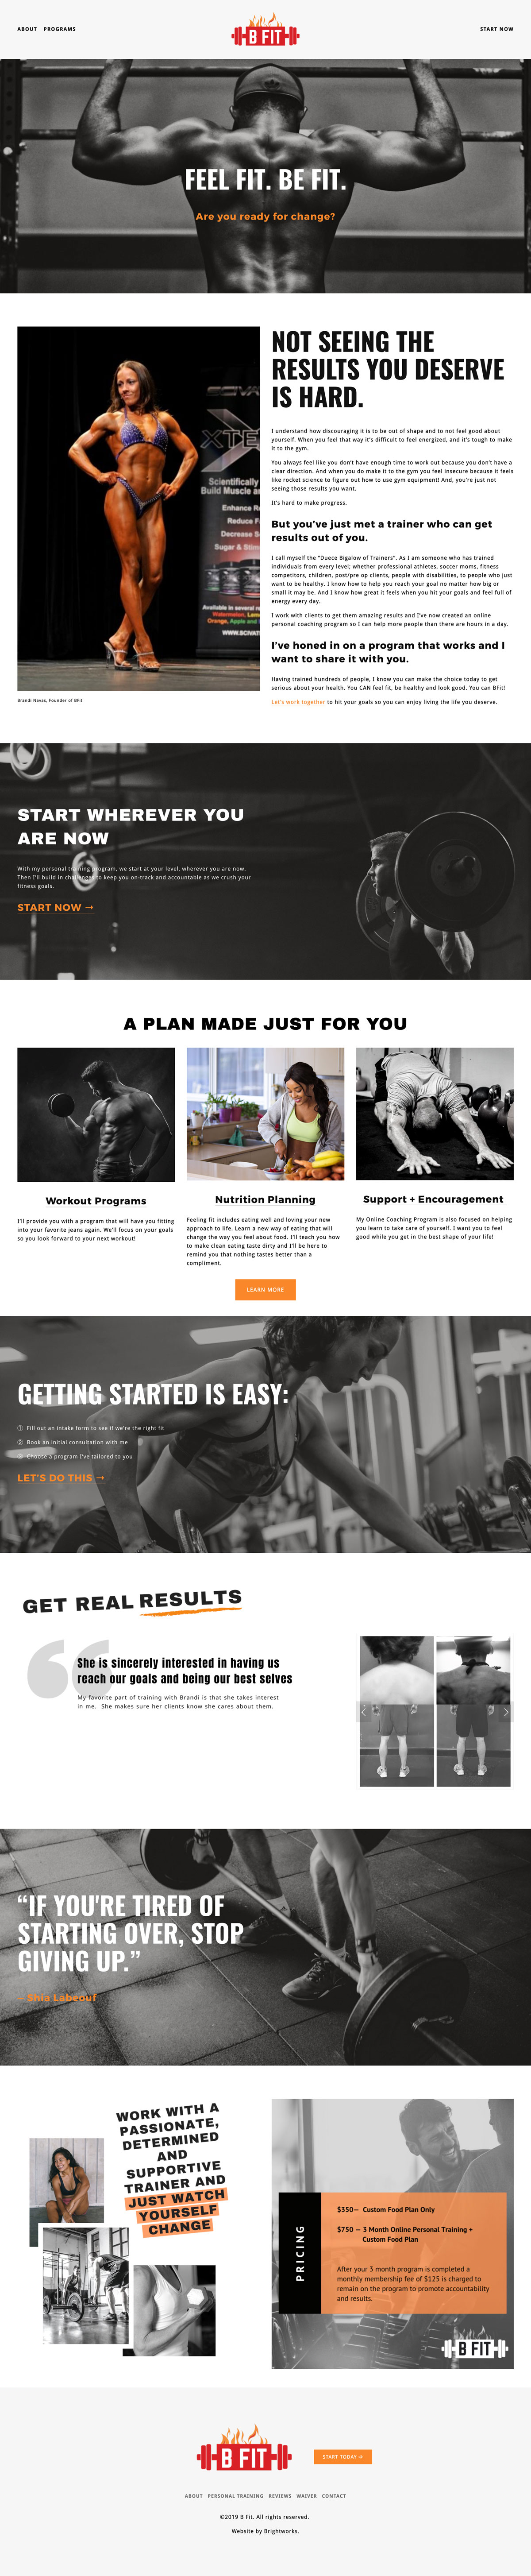 Website-design-for-B-Fit-by-Brightworks.jpg